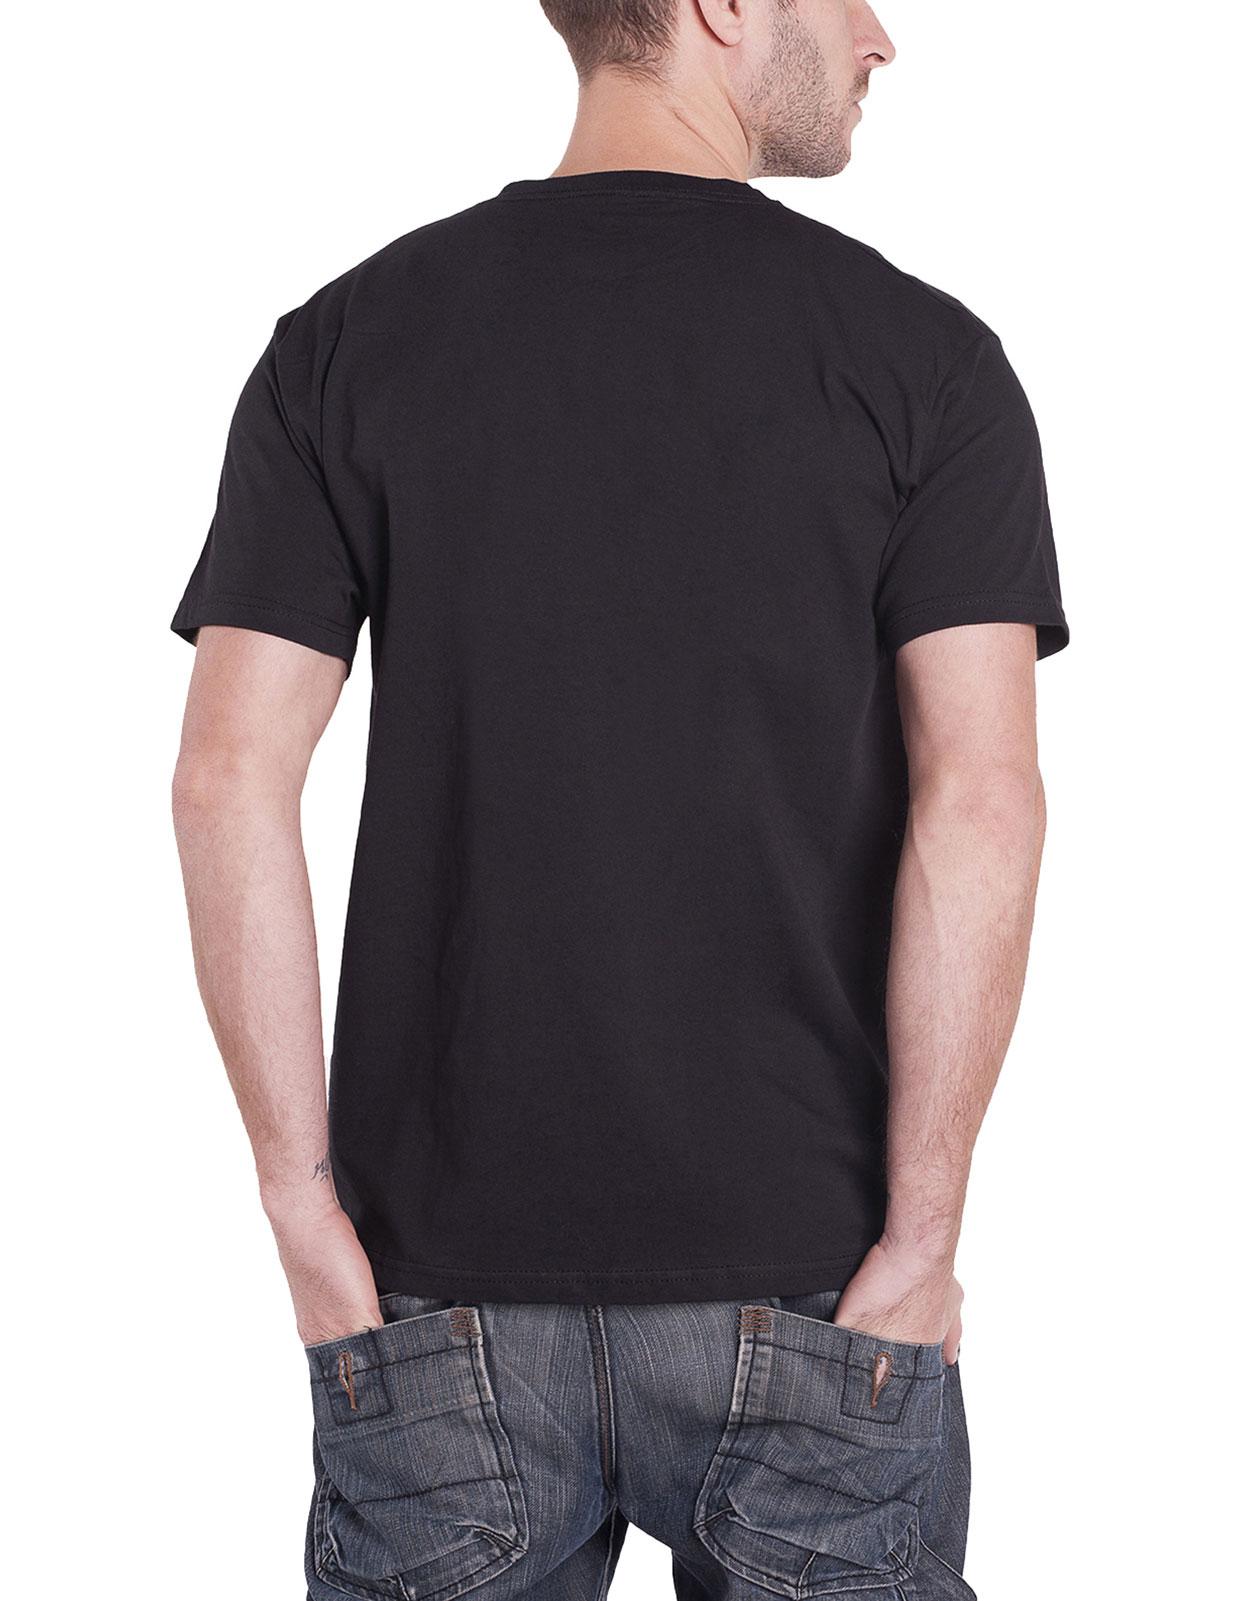 Camiseta-Last-Jedi-De-Star-Wars-Movie-Poster-porgs-Guardia-pretoriana-oficial-para-hombre miniatura 15